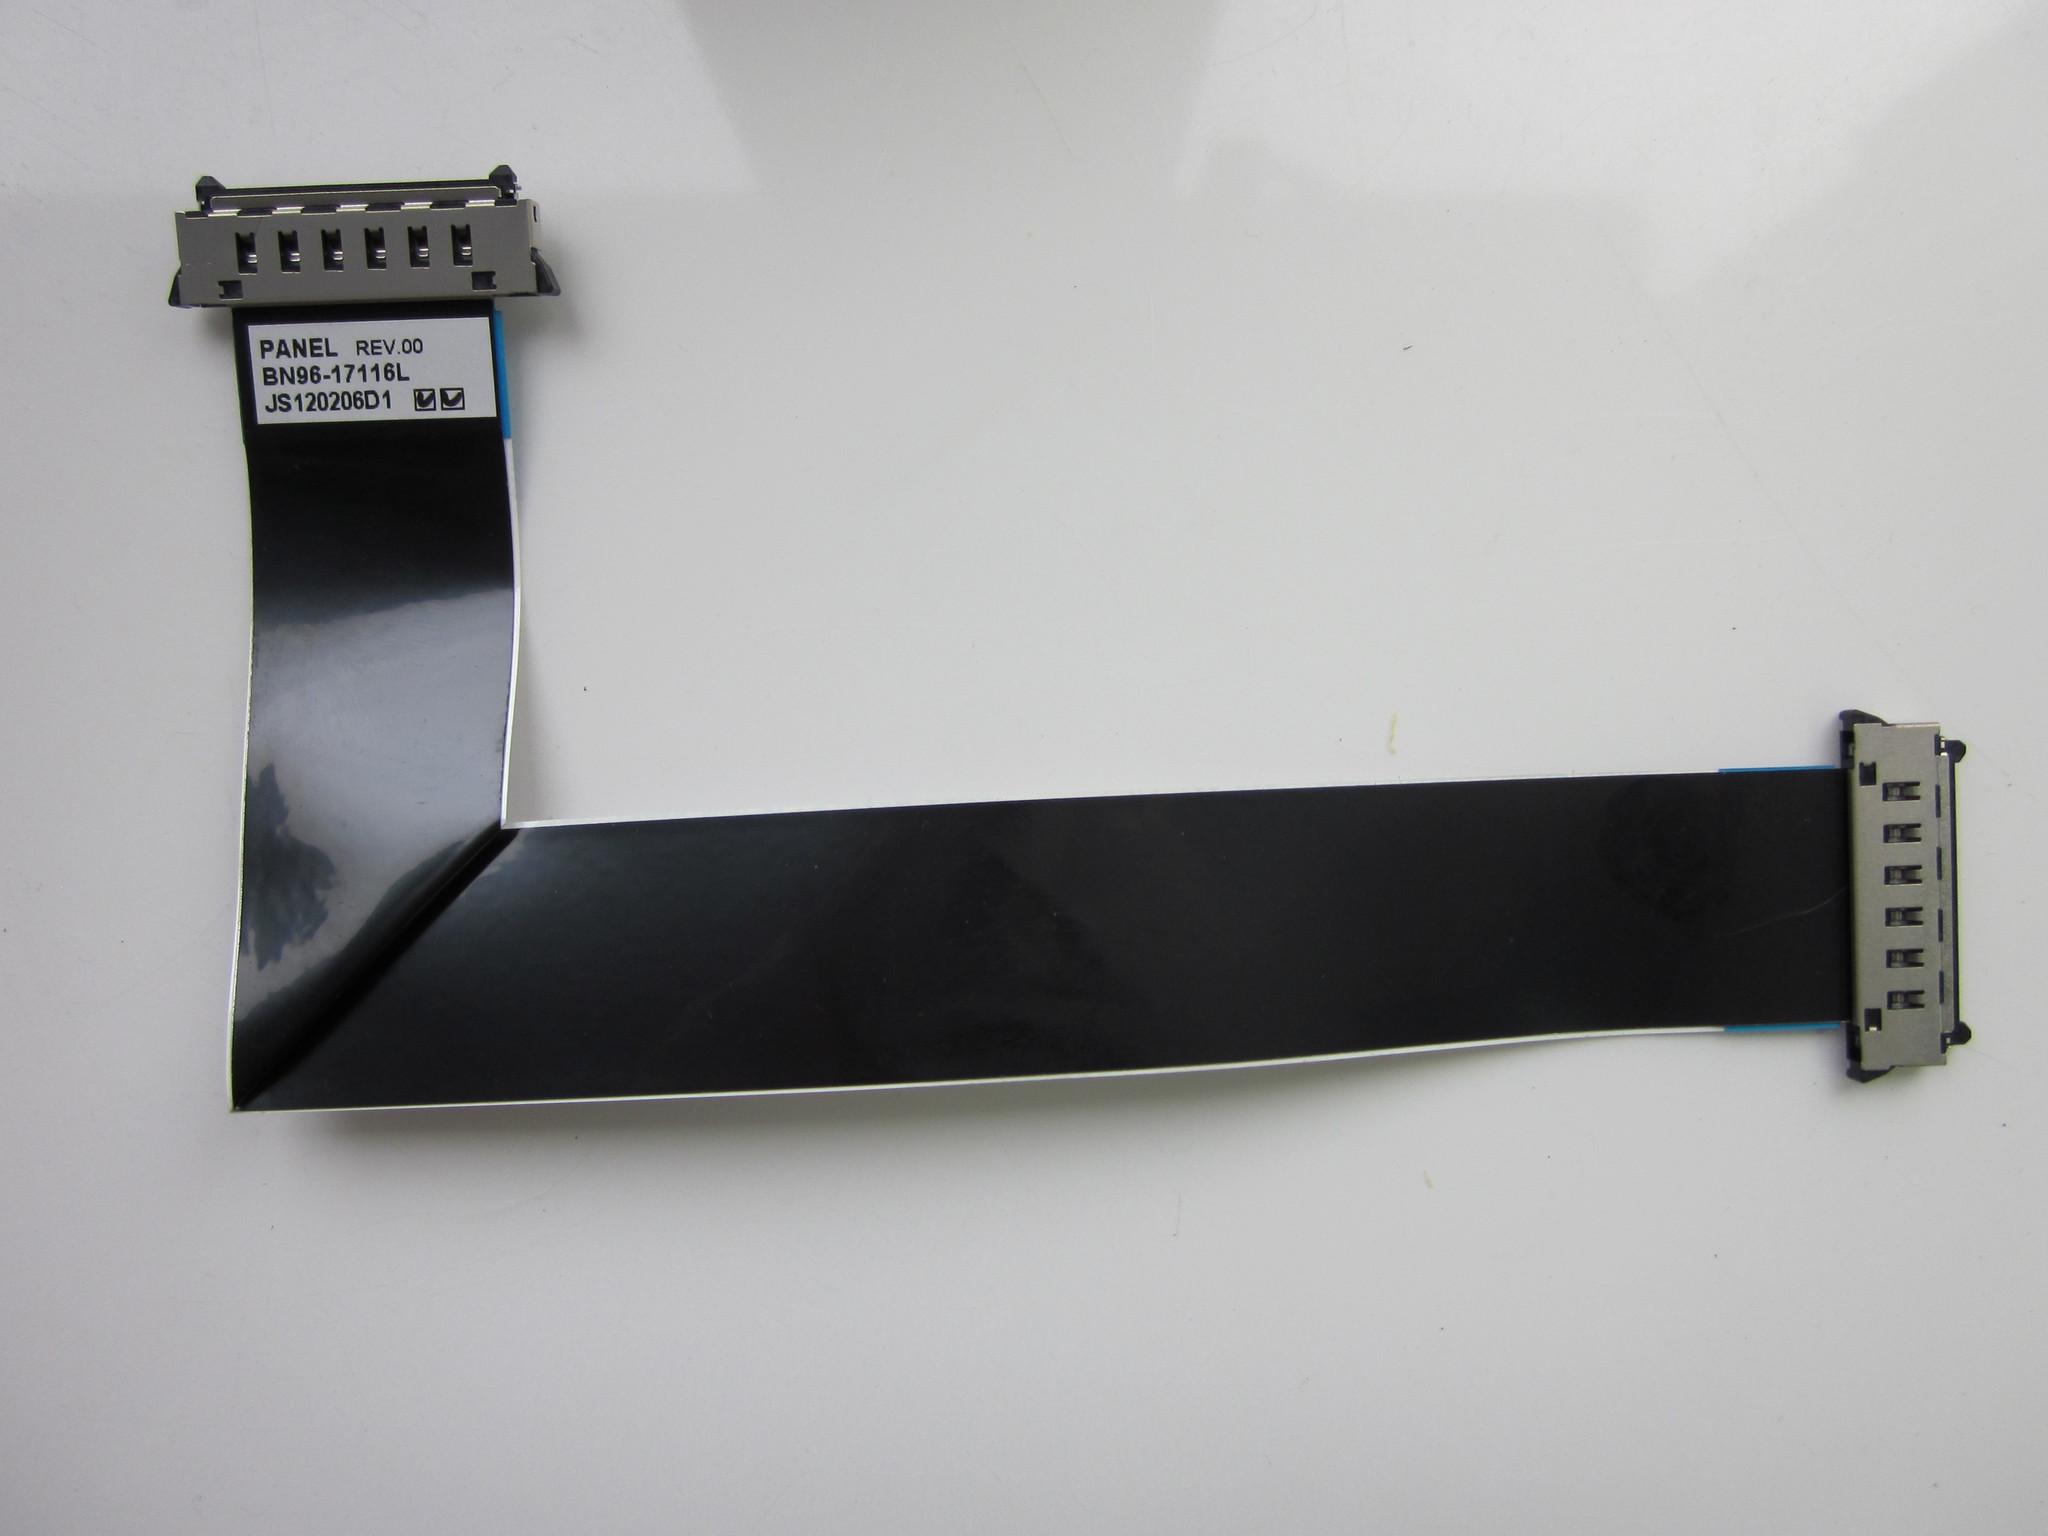 BN96-17116L REV.00